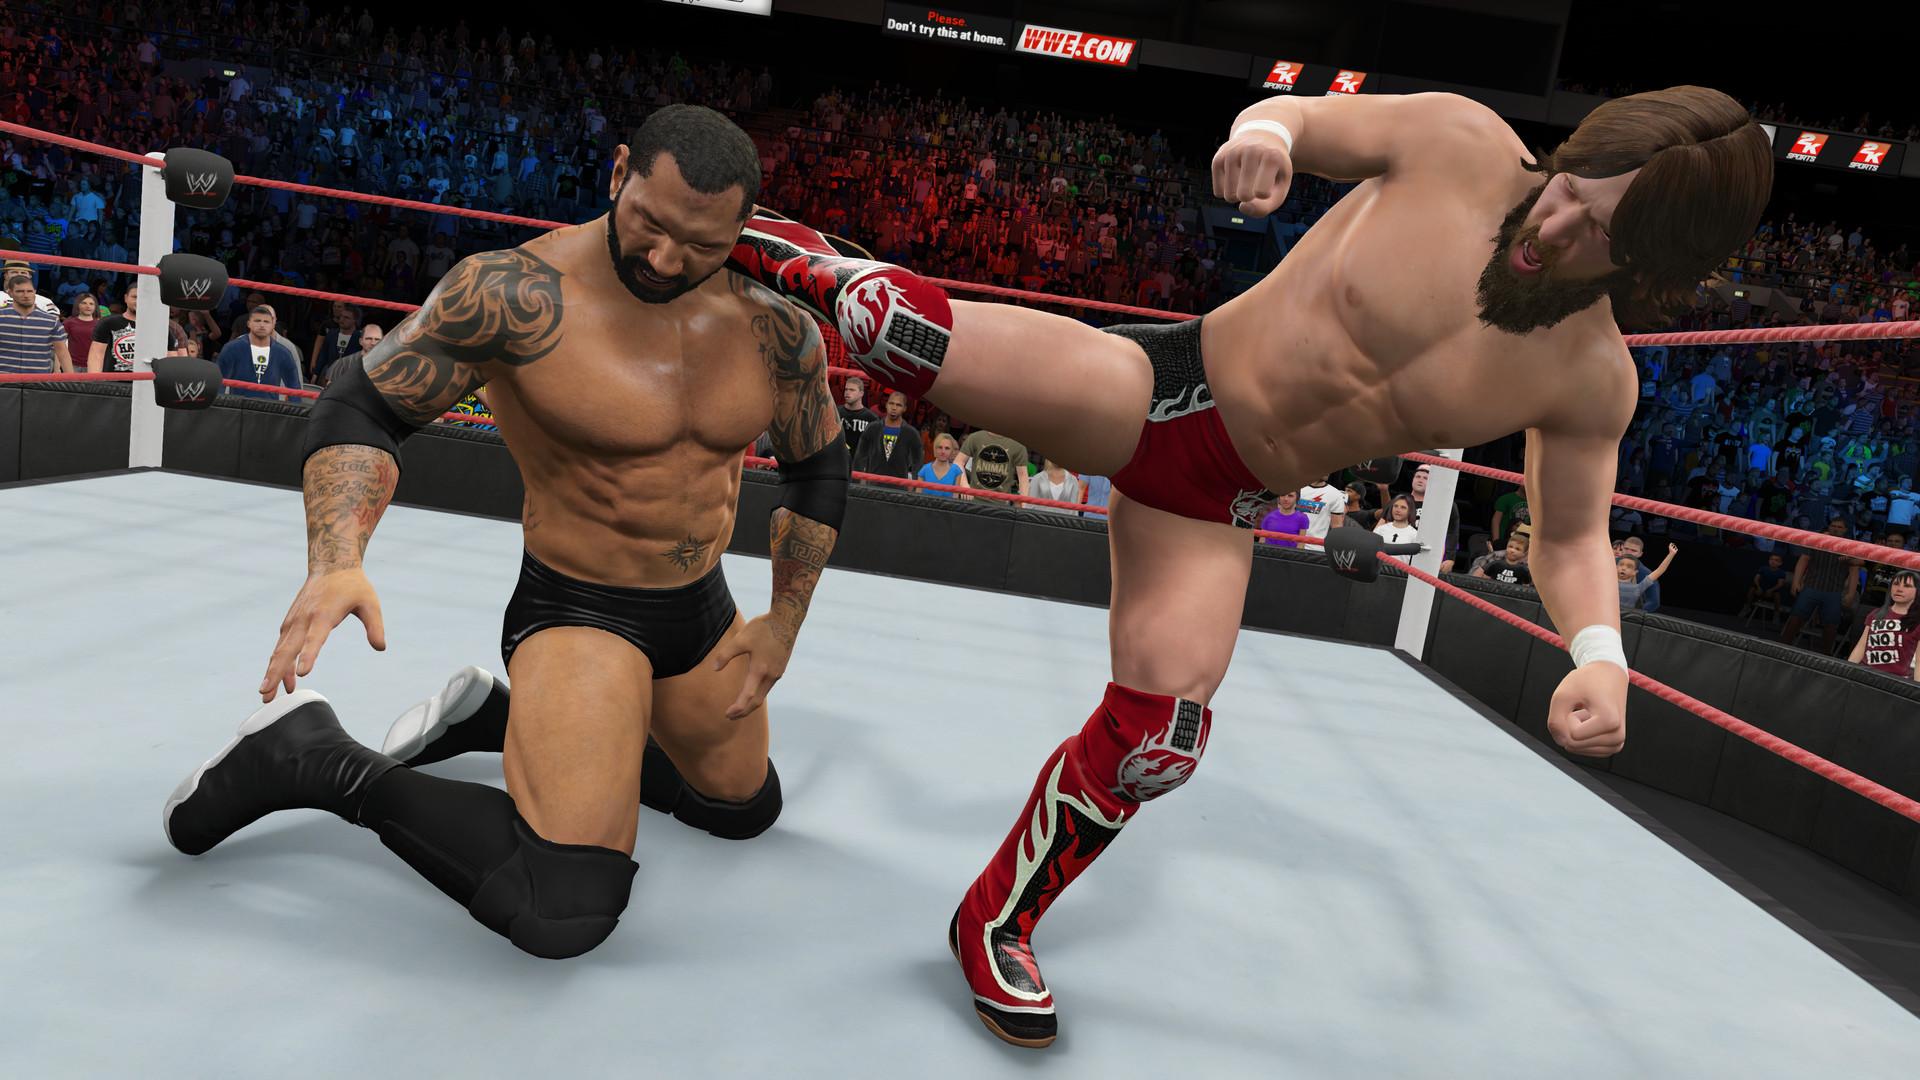 WWE 2K15 ESPAÑOL Full PC + DLC Pack Addon (RELOADED) + REPACK 5 DVD5 (JPW) 10